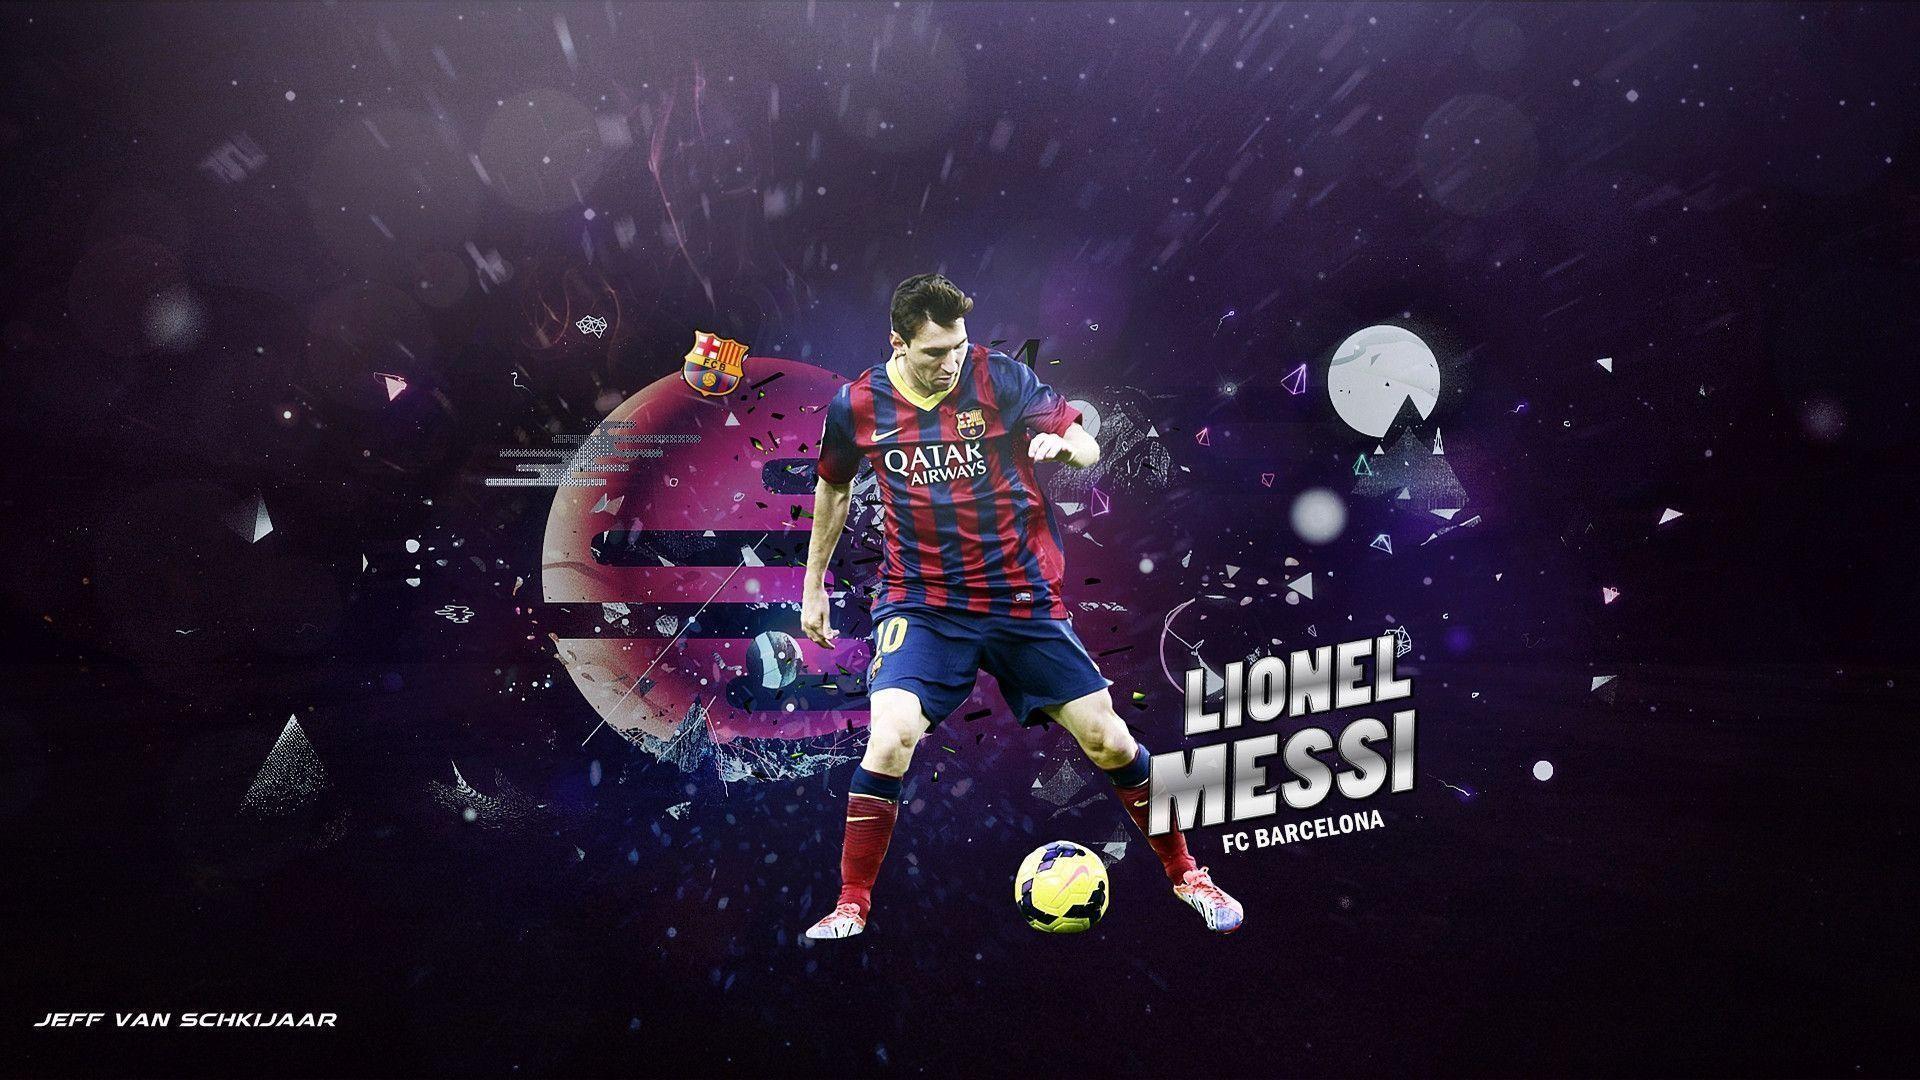 Lionel Messi FC Barcelona Wallpaper HD 2014 #4   Football .